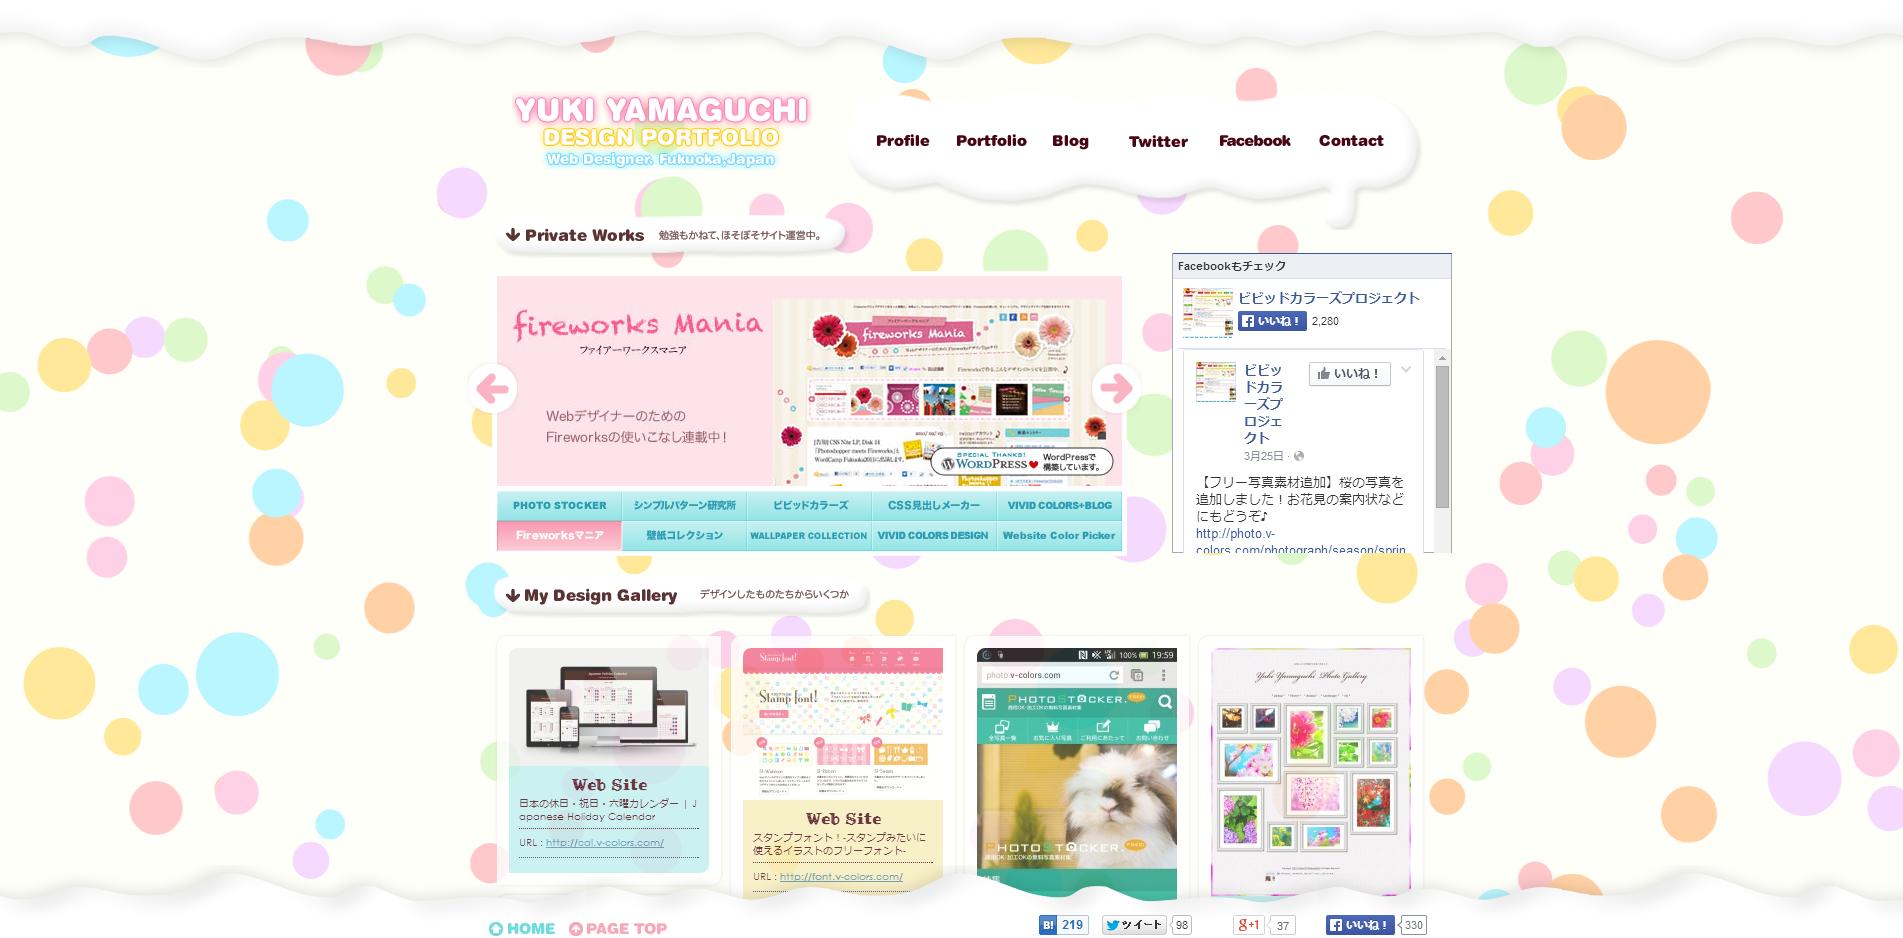 YUKI YAMAGUCHI Design Portfolio     Webデザイナー山口有由希のポートフォリオサイト